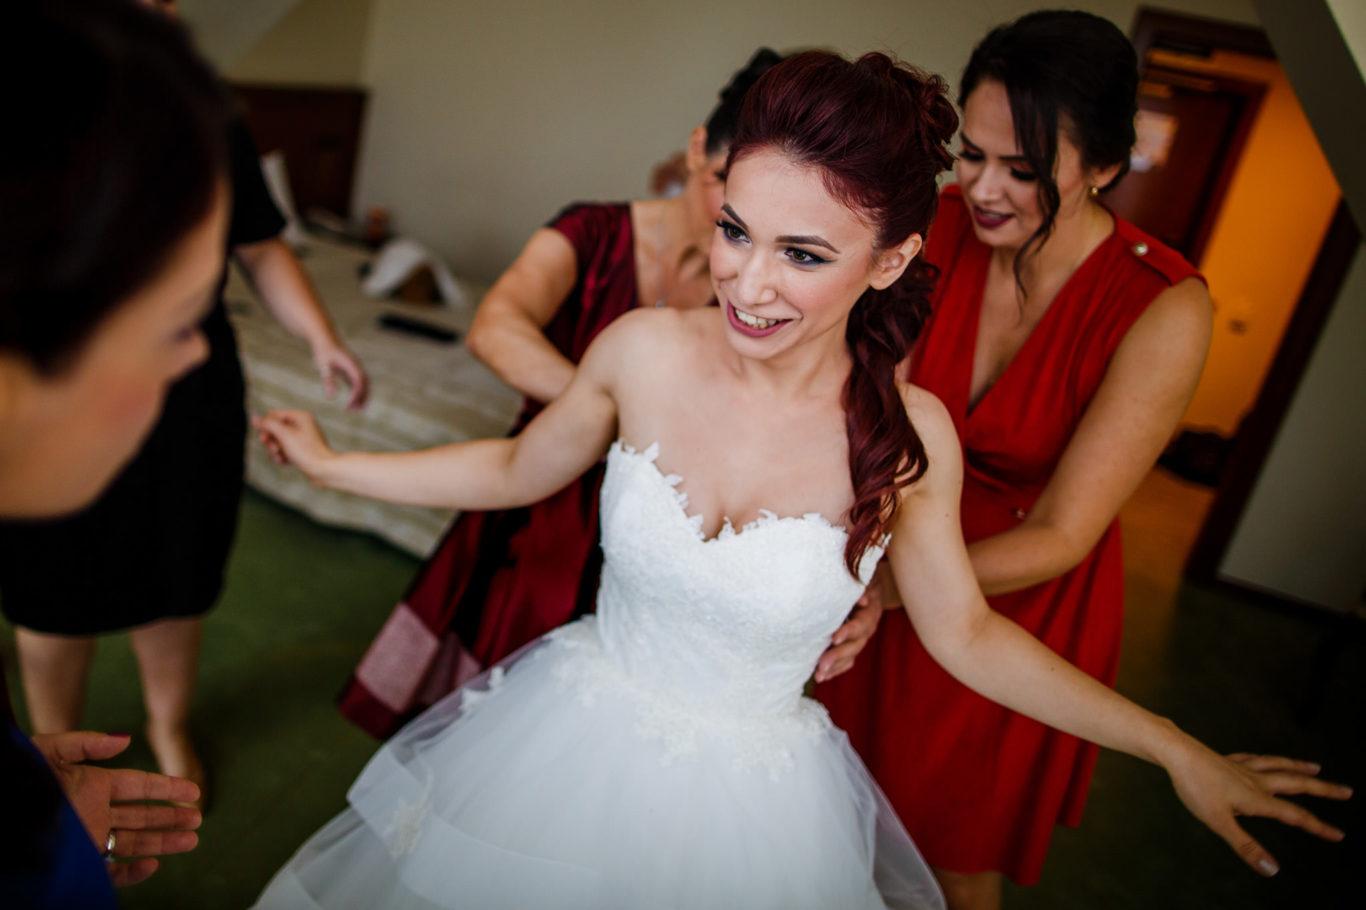 0073-fotografie-nunta-bucuresti-cristina-nicusor-fotograf-ciprian-dumitrescu-dc1_0711